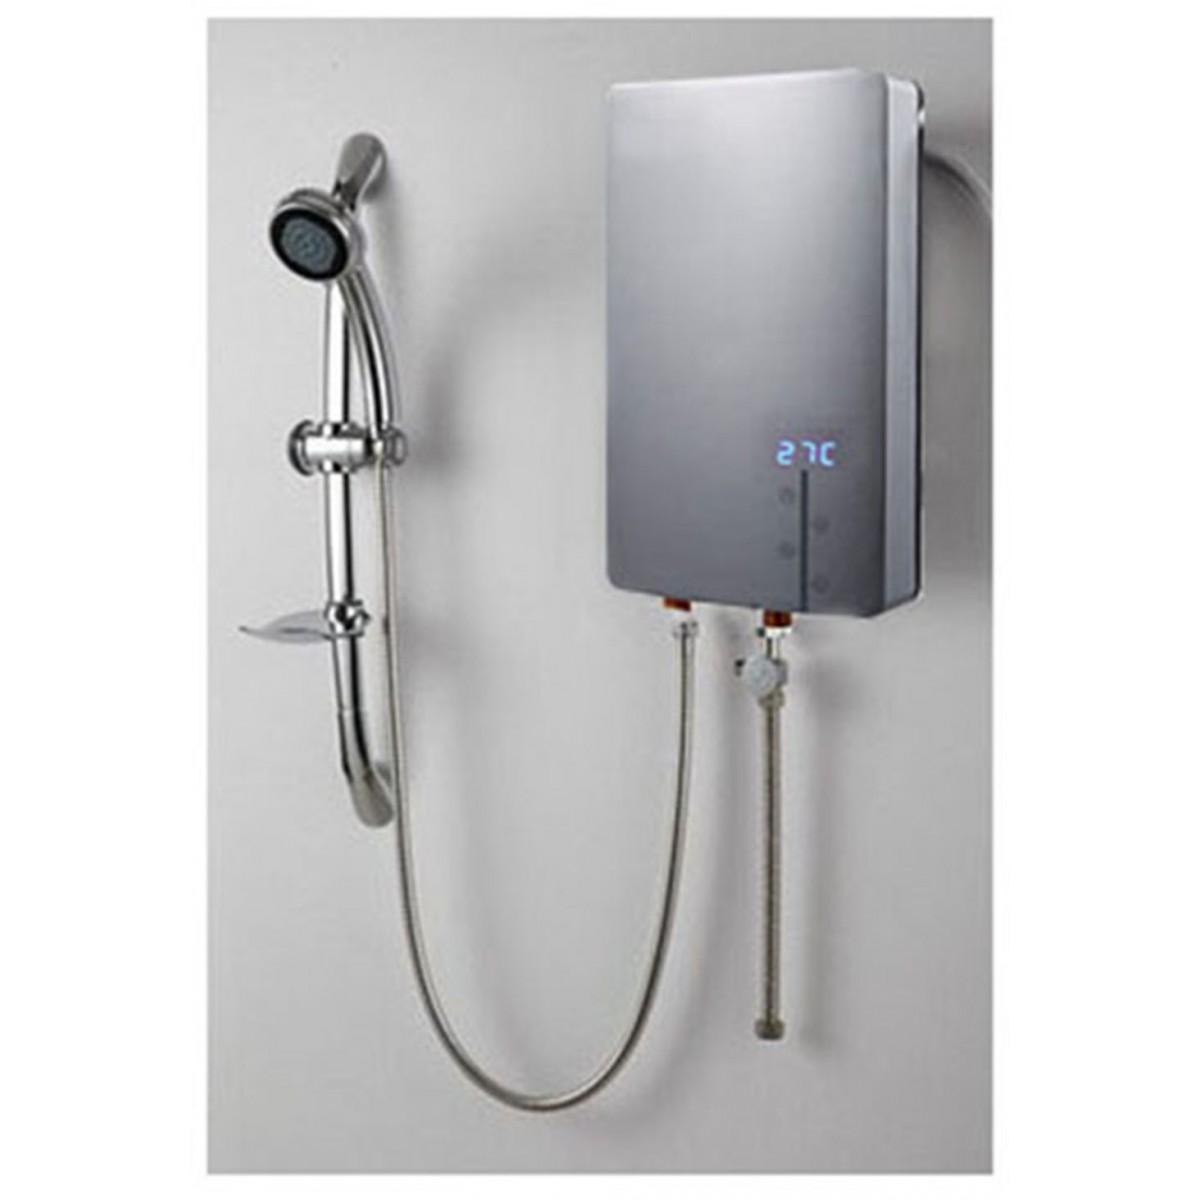 chauffe-eau-instantane-11KW-douche